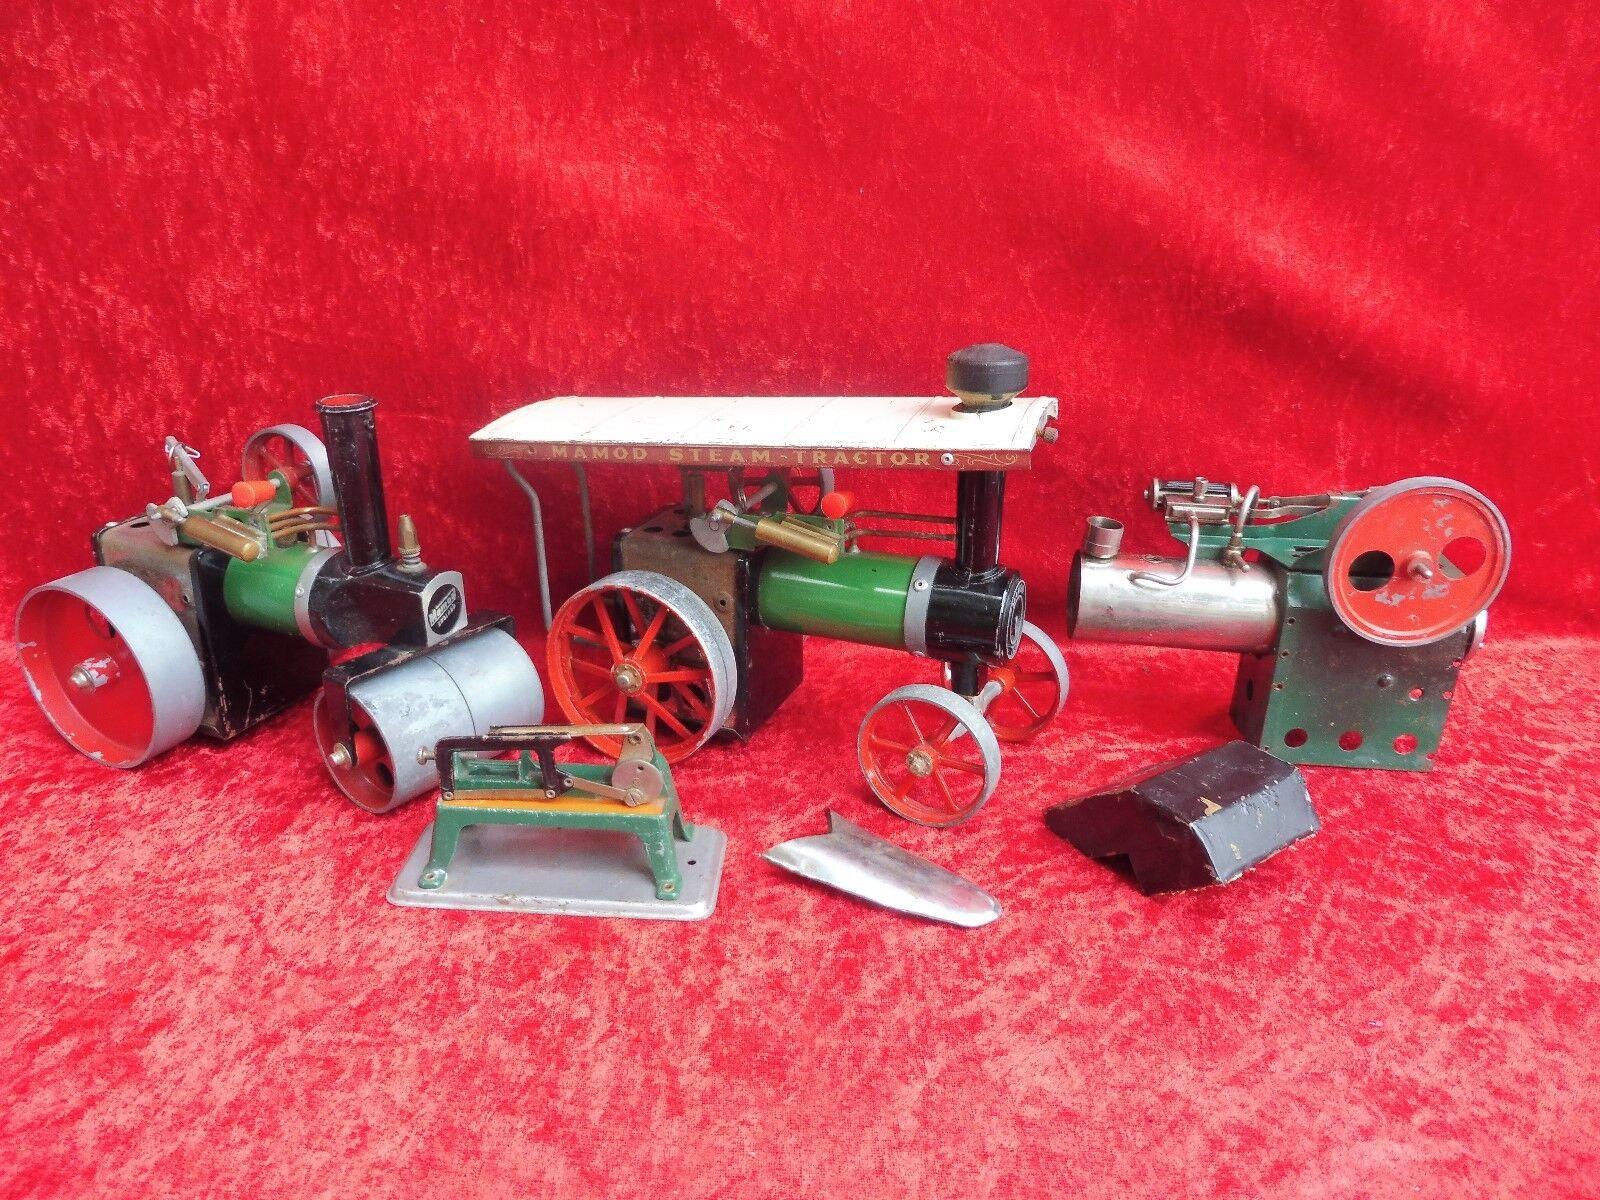 Antiguo Motores de Vapor __ Dampfstielzeug __ Rodillo, Tractor __ Mamod